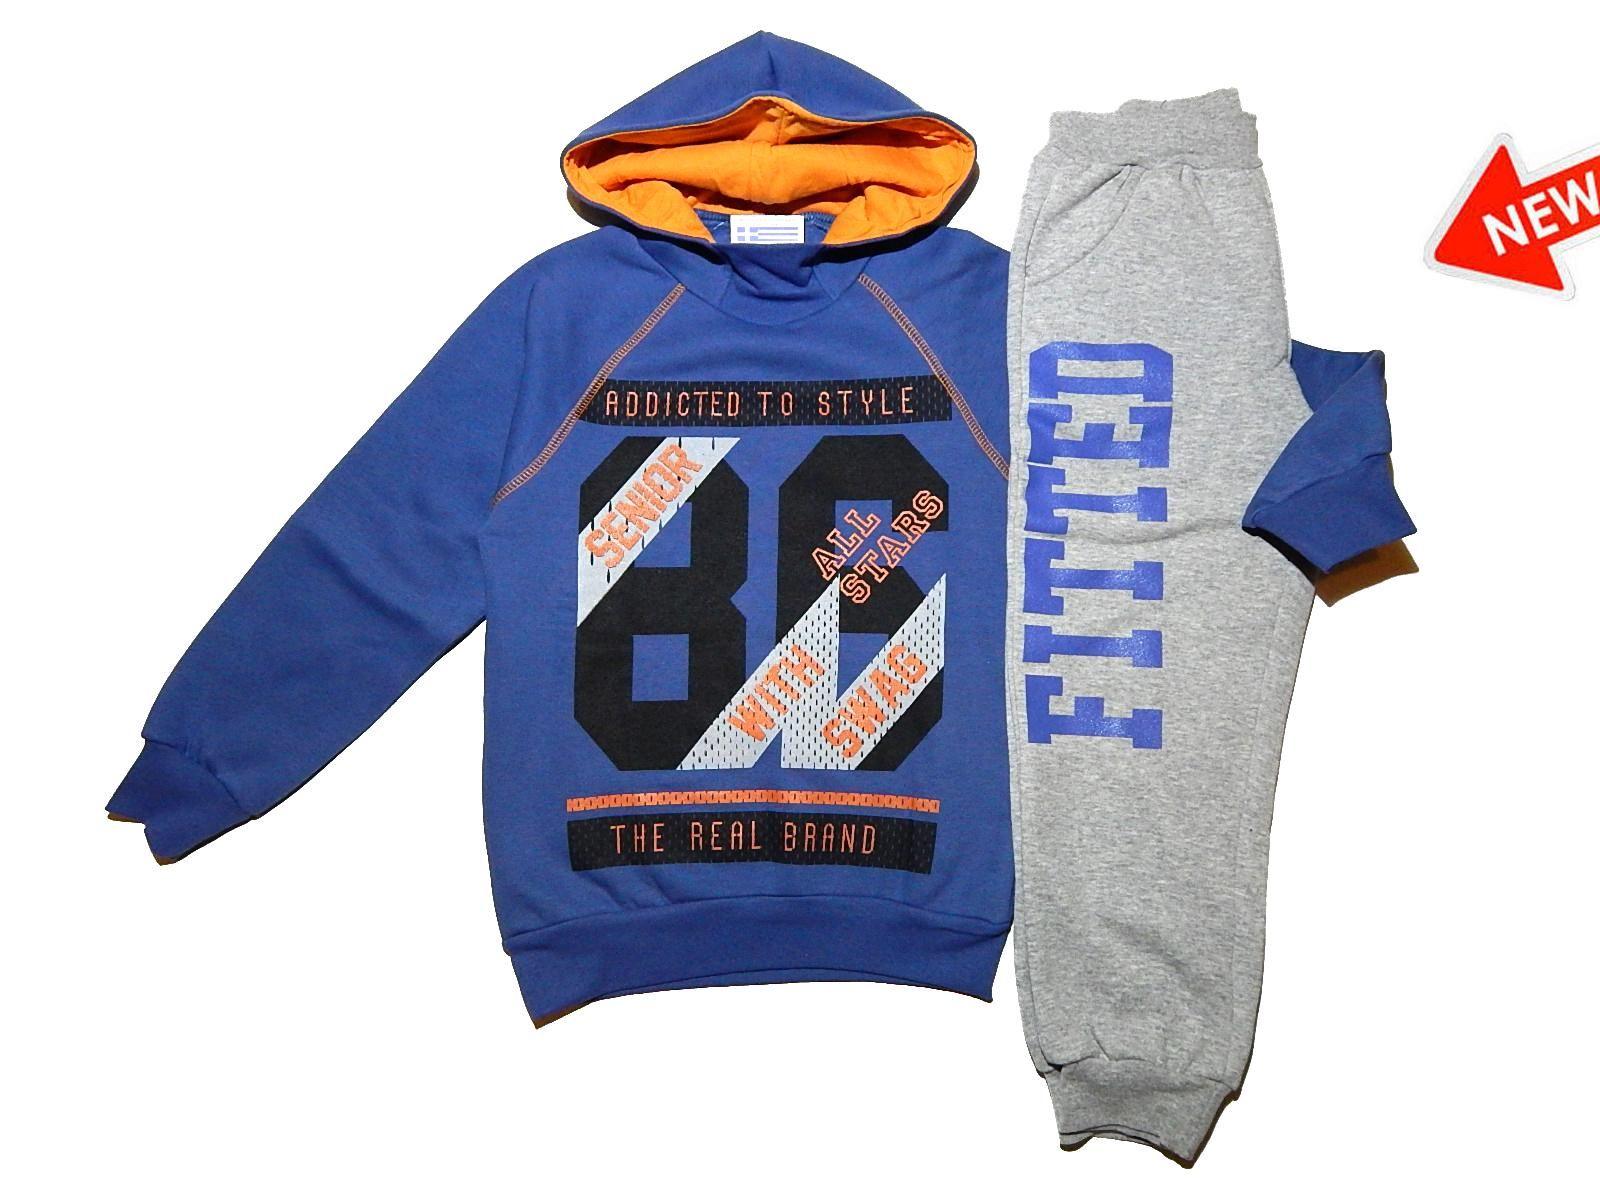 aa7bdc5332b Παιδικά ρούχα για αγόρια από 4 έως 14 ετών - Φόρμες - Σετ από φούτερ ύφασμα  για αγόρια.20.00